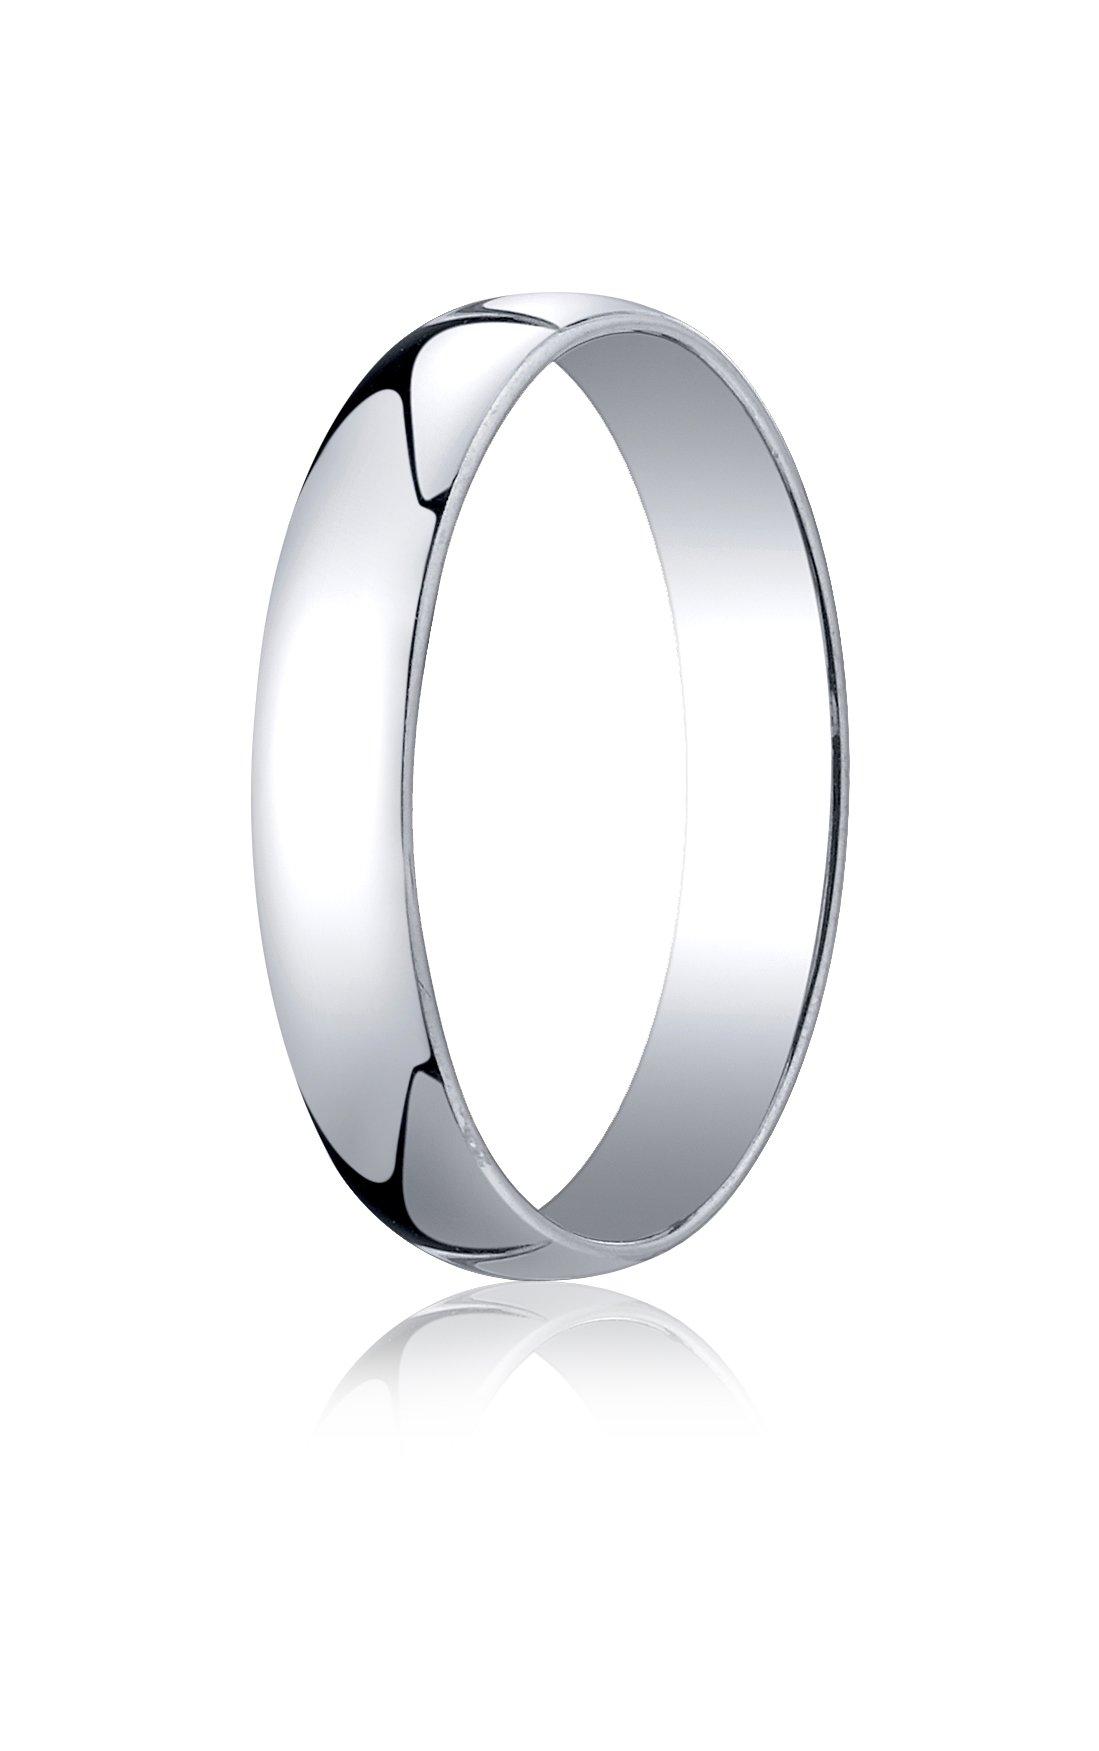 Mens 14K White Gold, 4.0mm Low Dome Light Ring (sz 11.5)